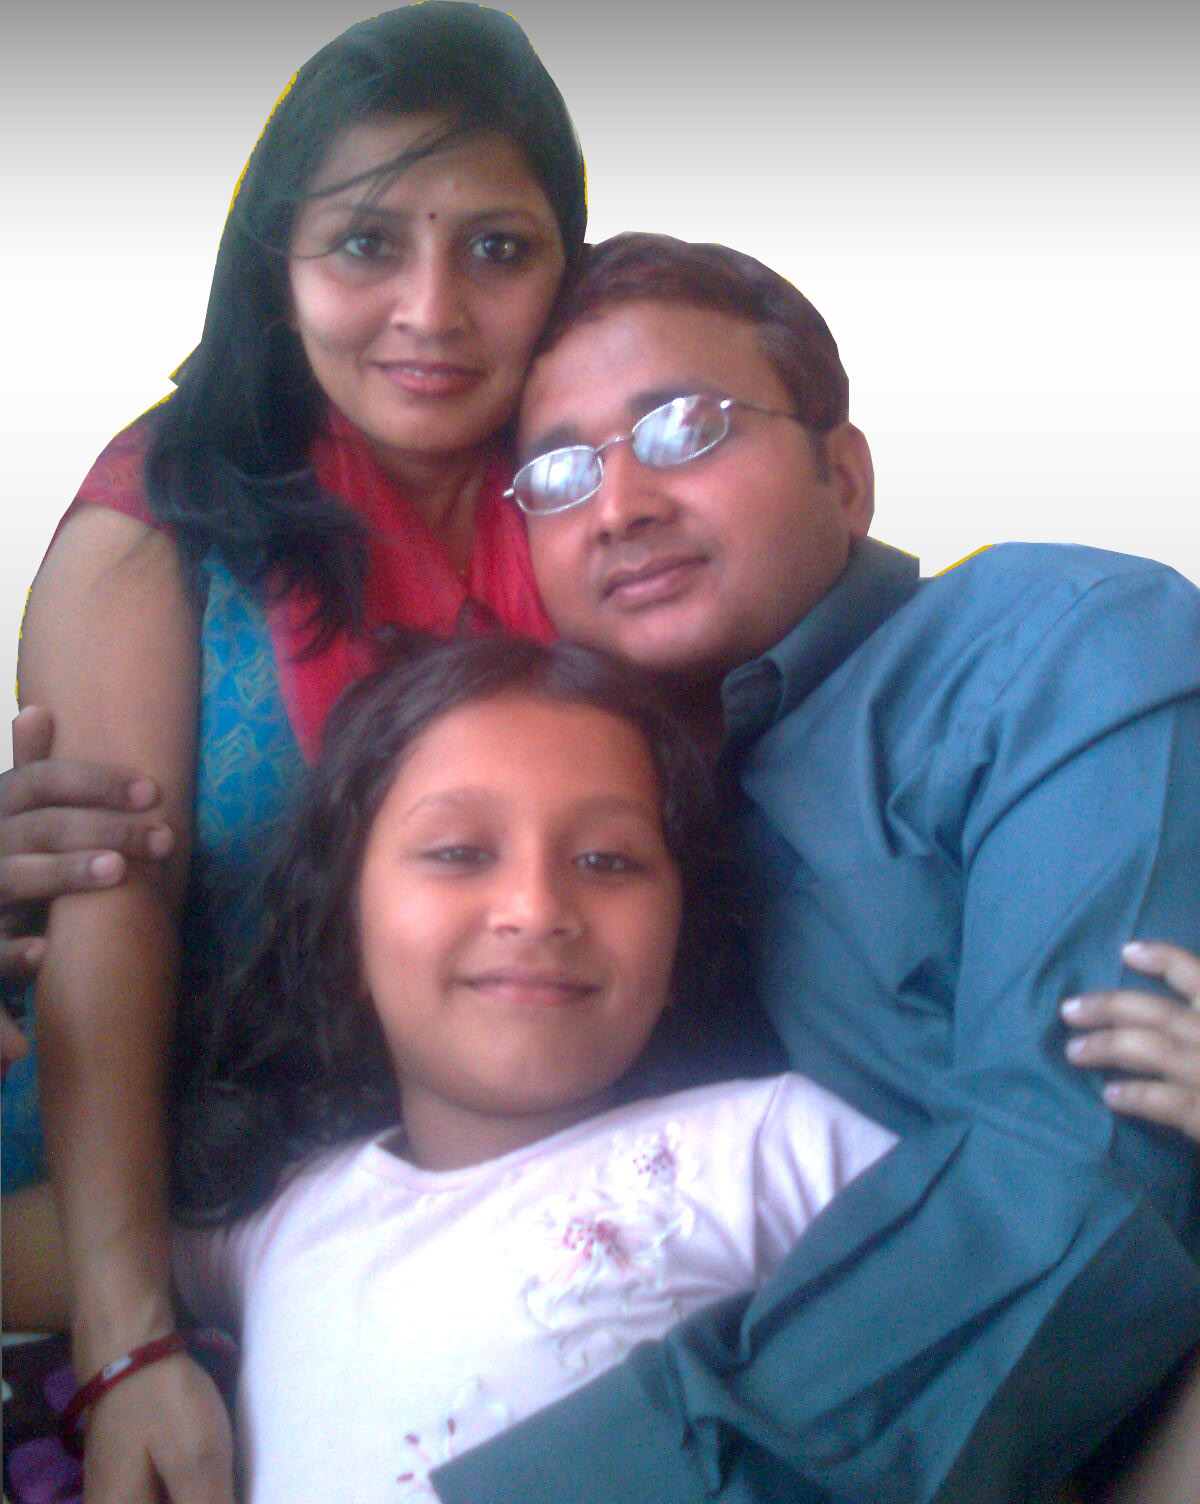 Prajwal with his family